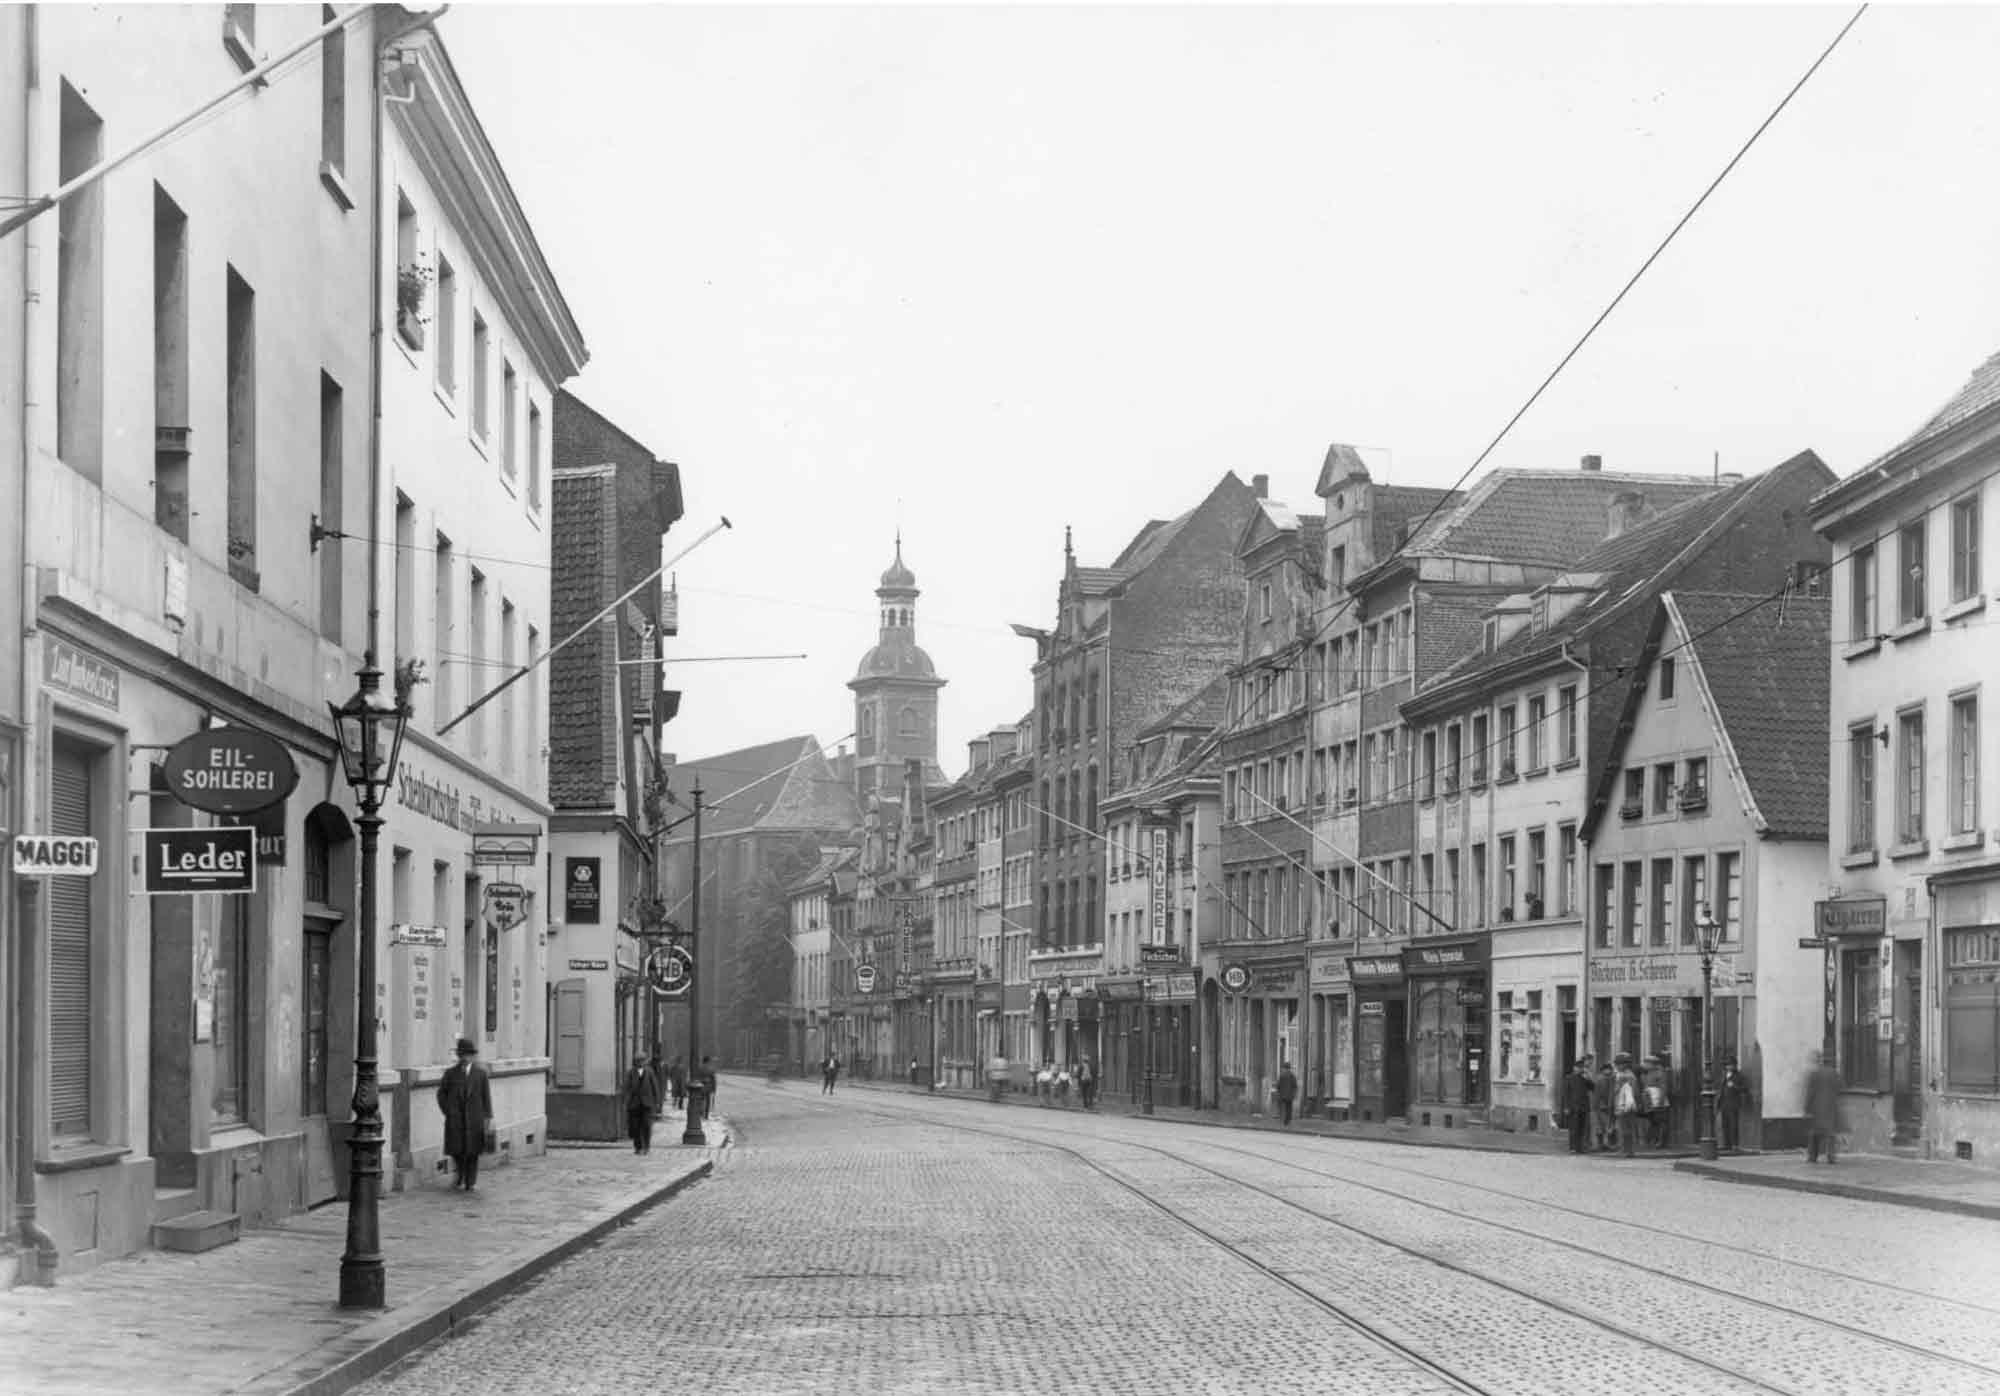 Ratinger Straße Düsseldorf